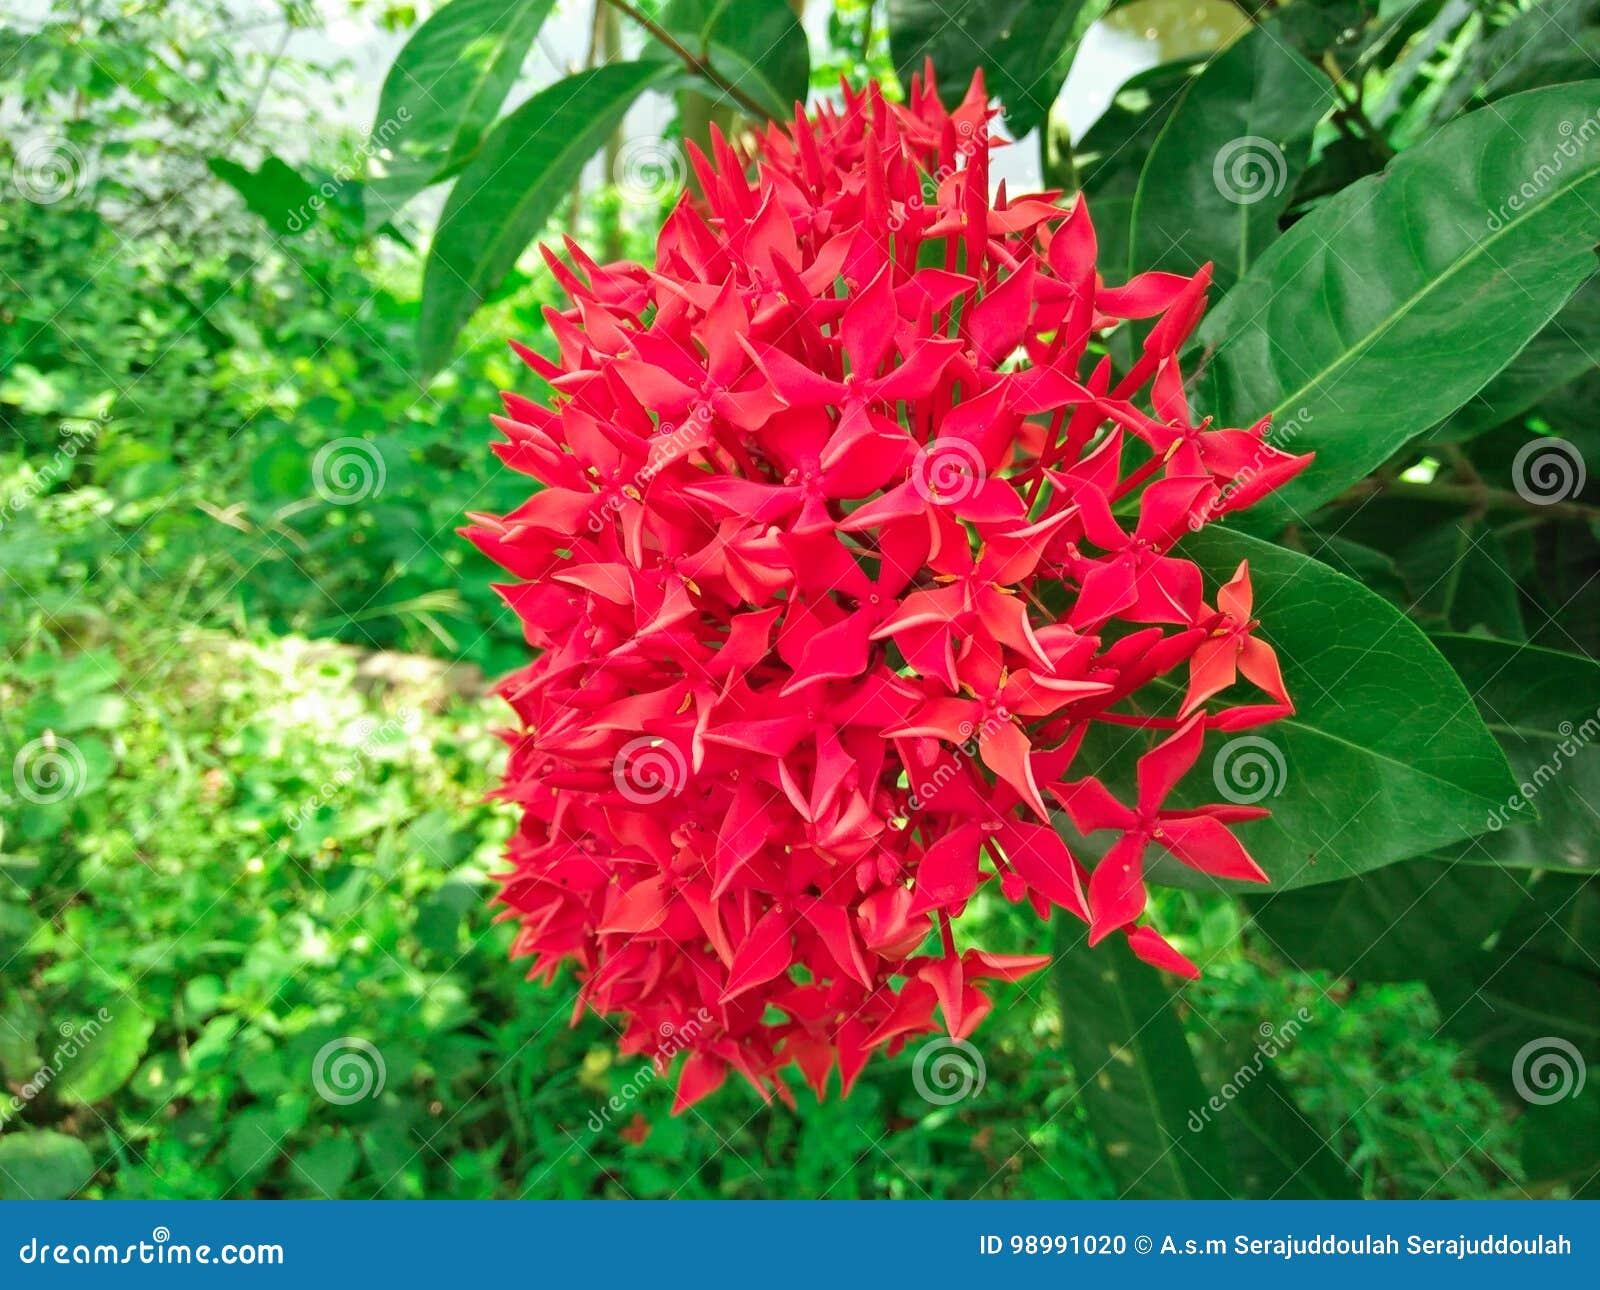 Bunch of beautiful red ixora flowers stock photo image of flowe download bunch of beautiful red ixora flowers stock photo image of flowe ixora izmirmasajfo